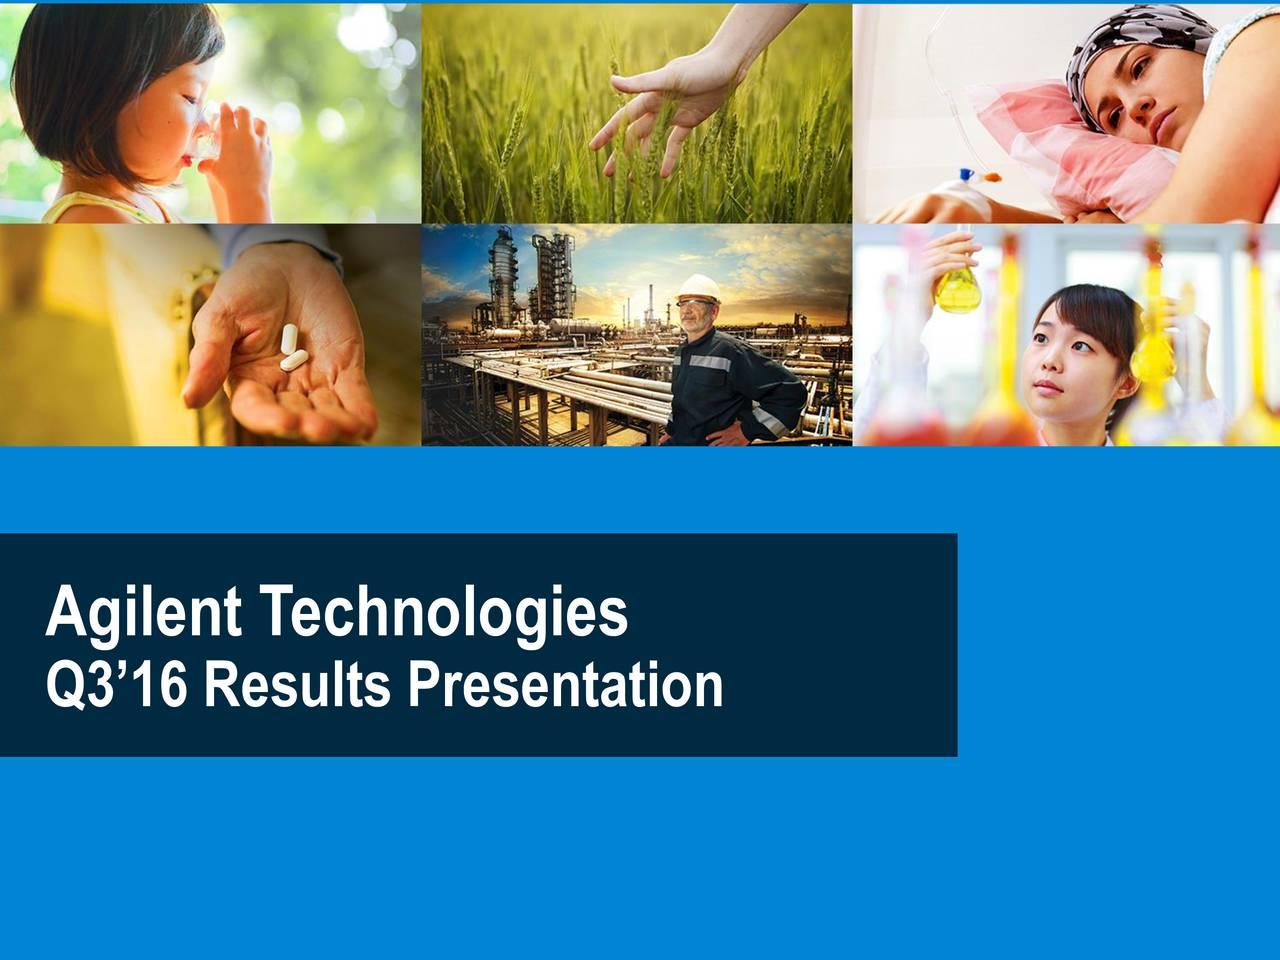 Q316 Results Presentation